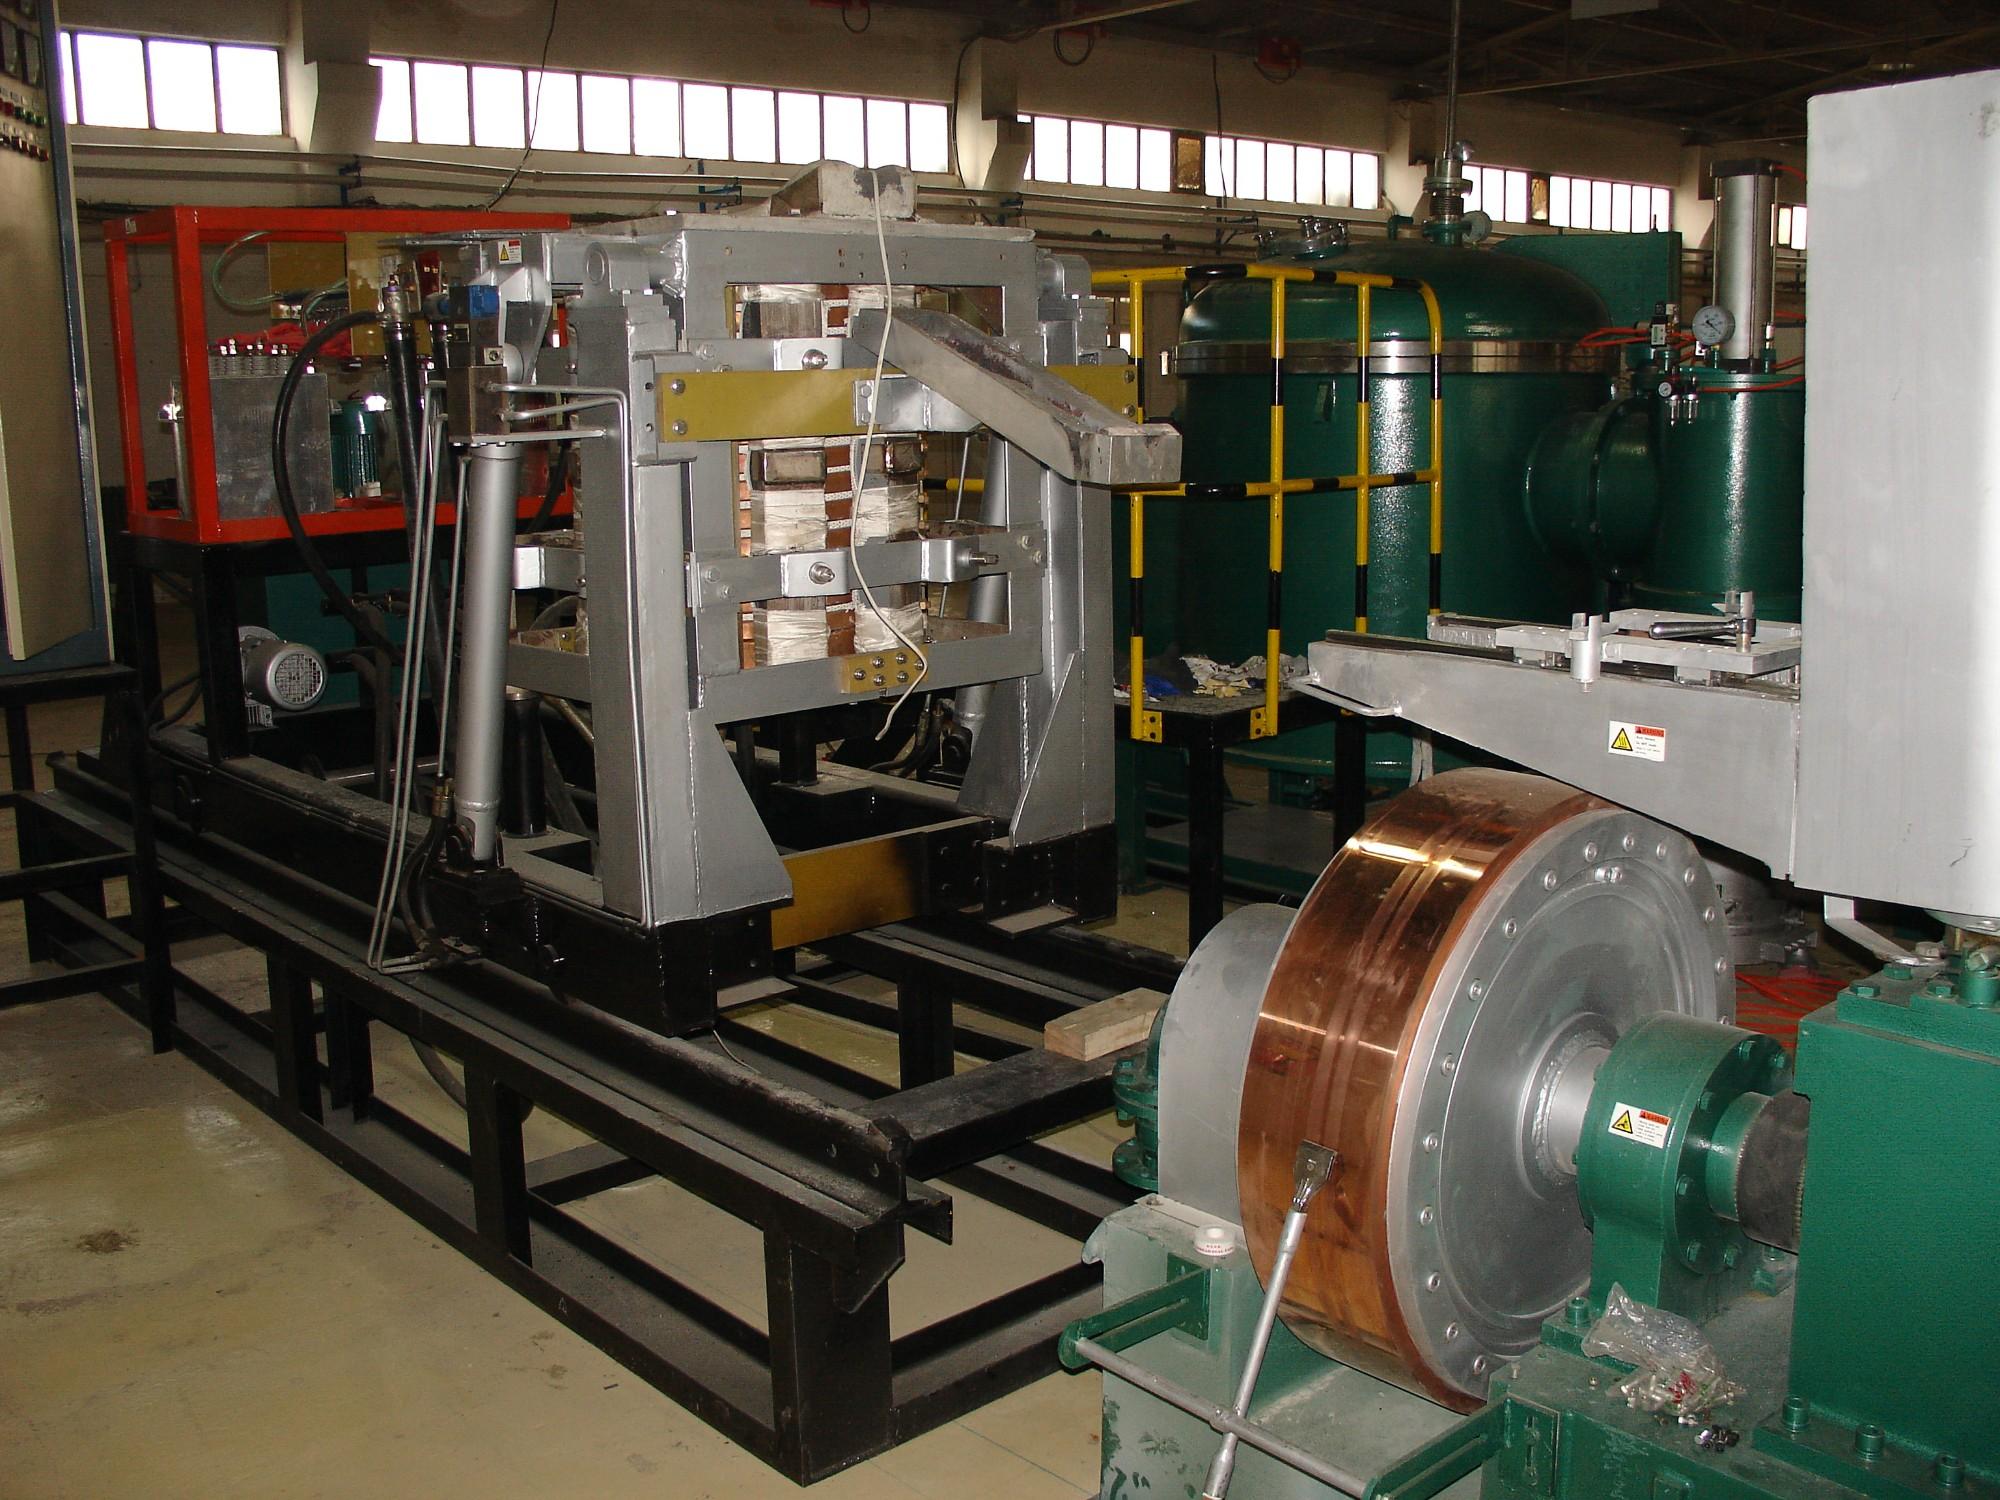 Amorphous Ribbon Furnace Manufacturers, Amorphous Ribbon Furnace Factory, Supply Amorphous Ribbon Furnace